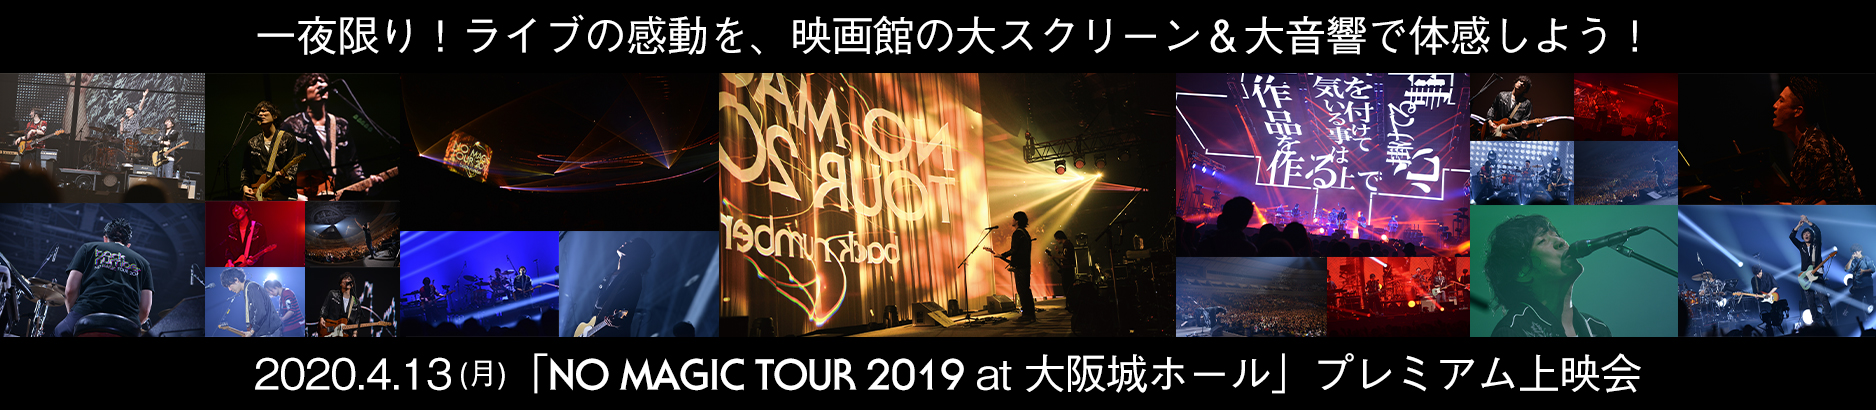 NO MAGIC TOUR プレミアム上映会